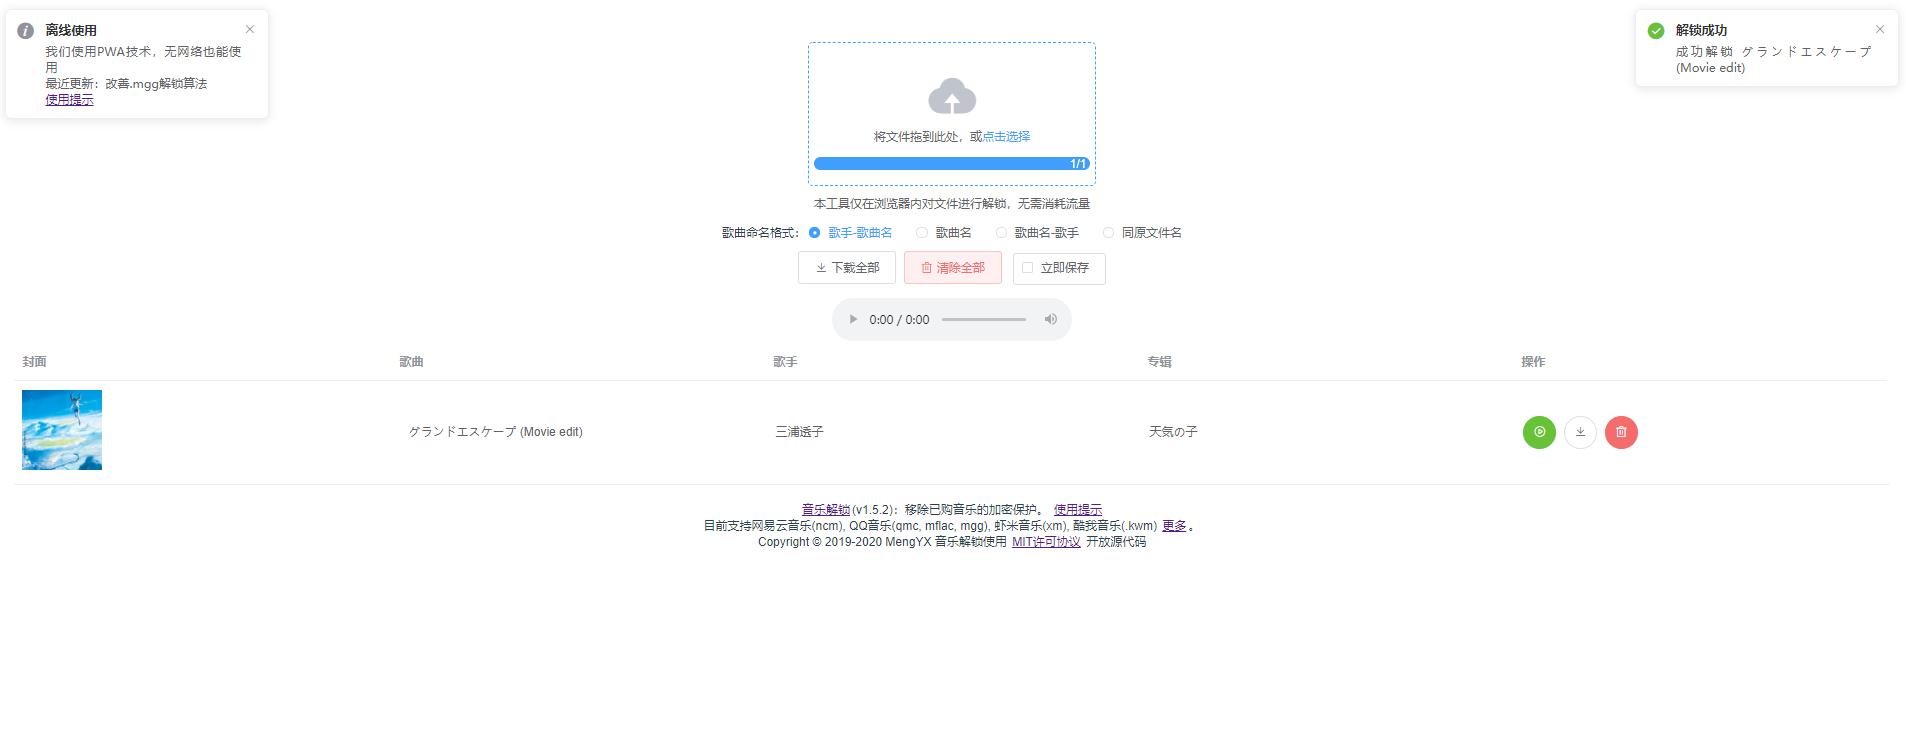 Unlock Music 音乐解锁加密保护HTML源码插图(1)